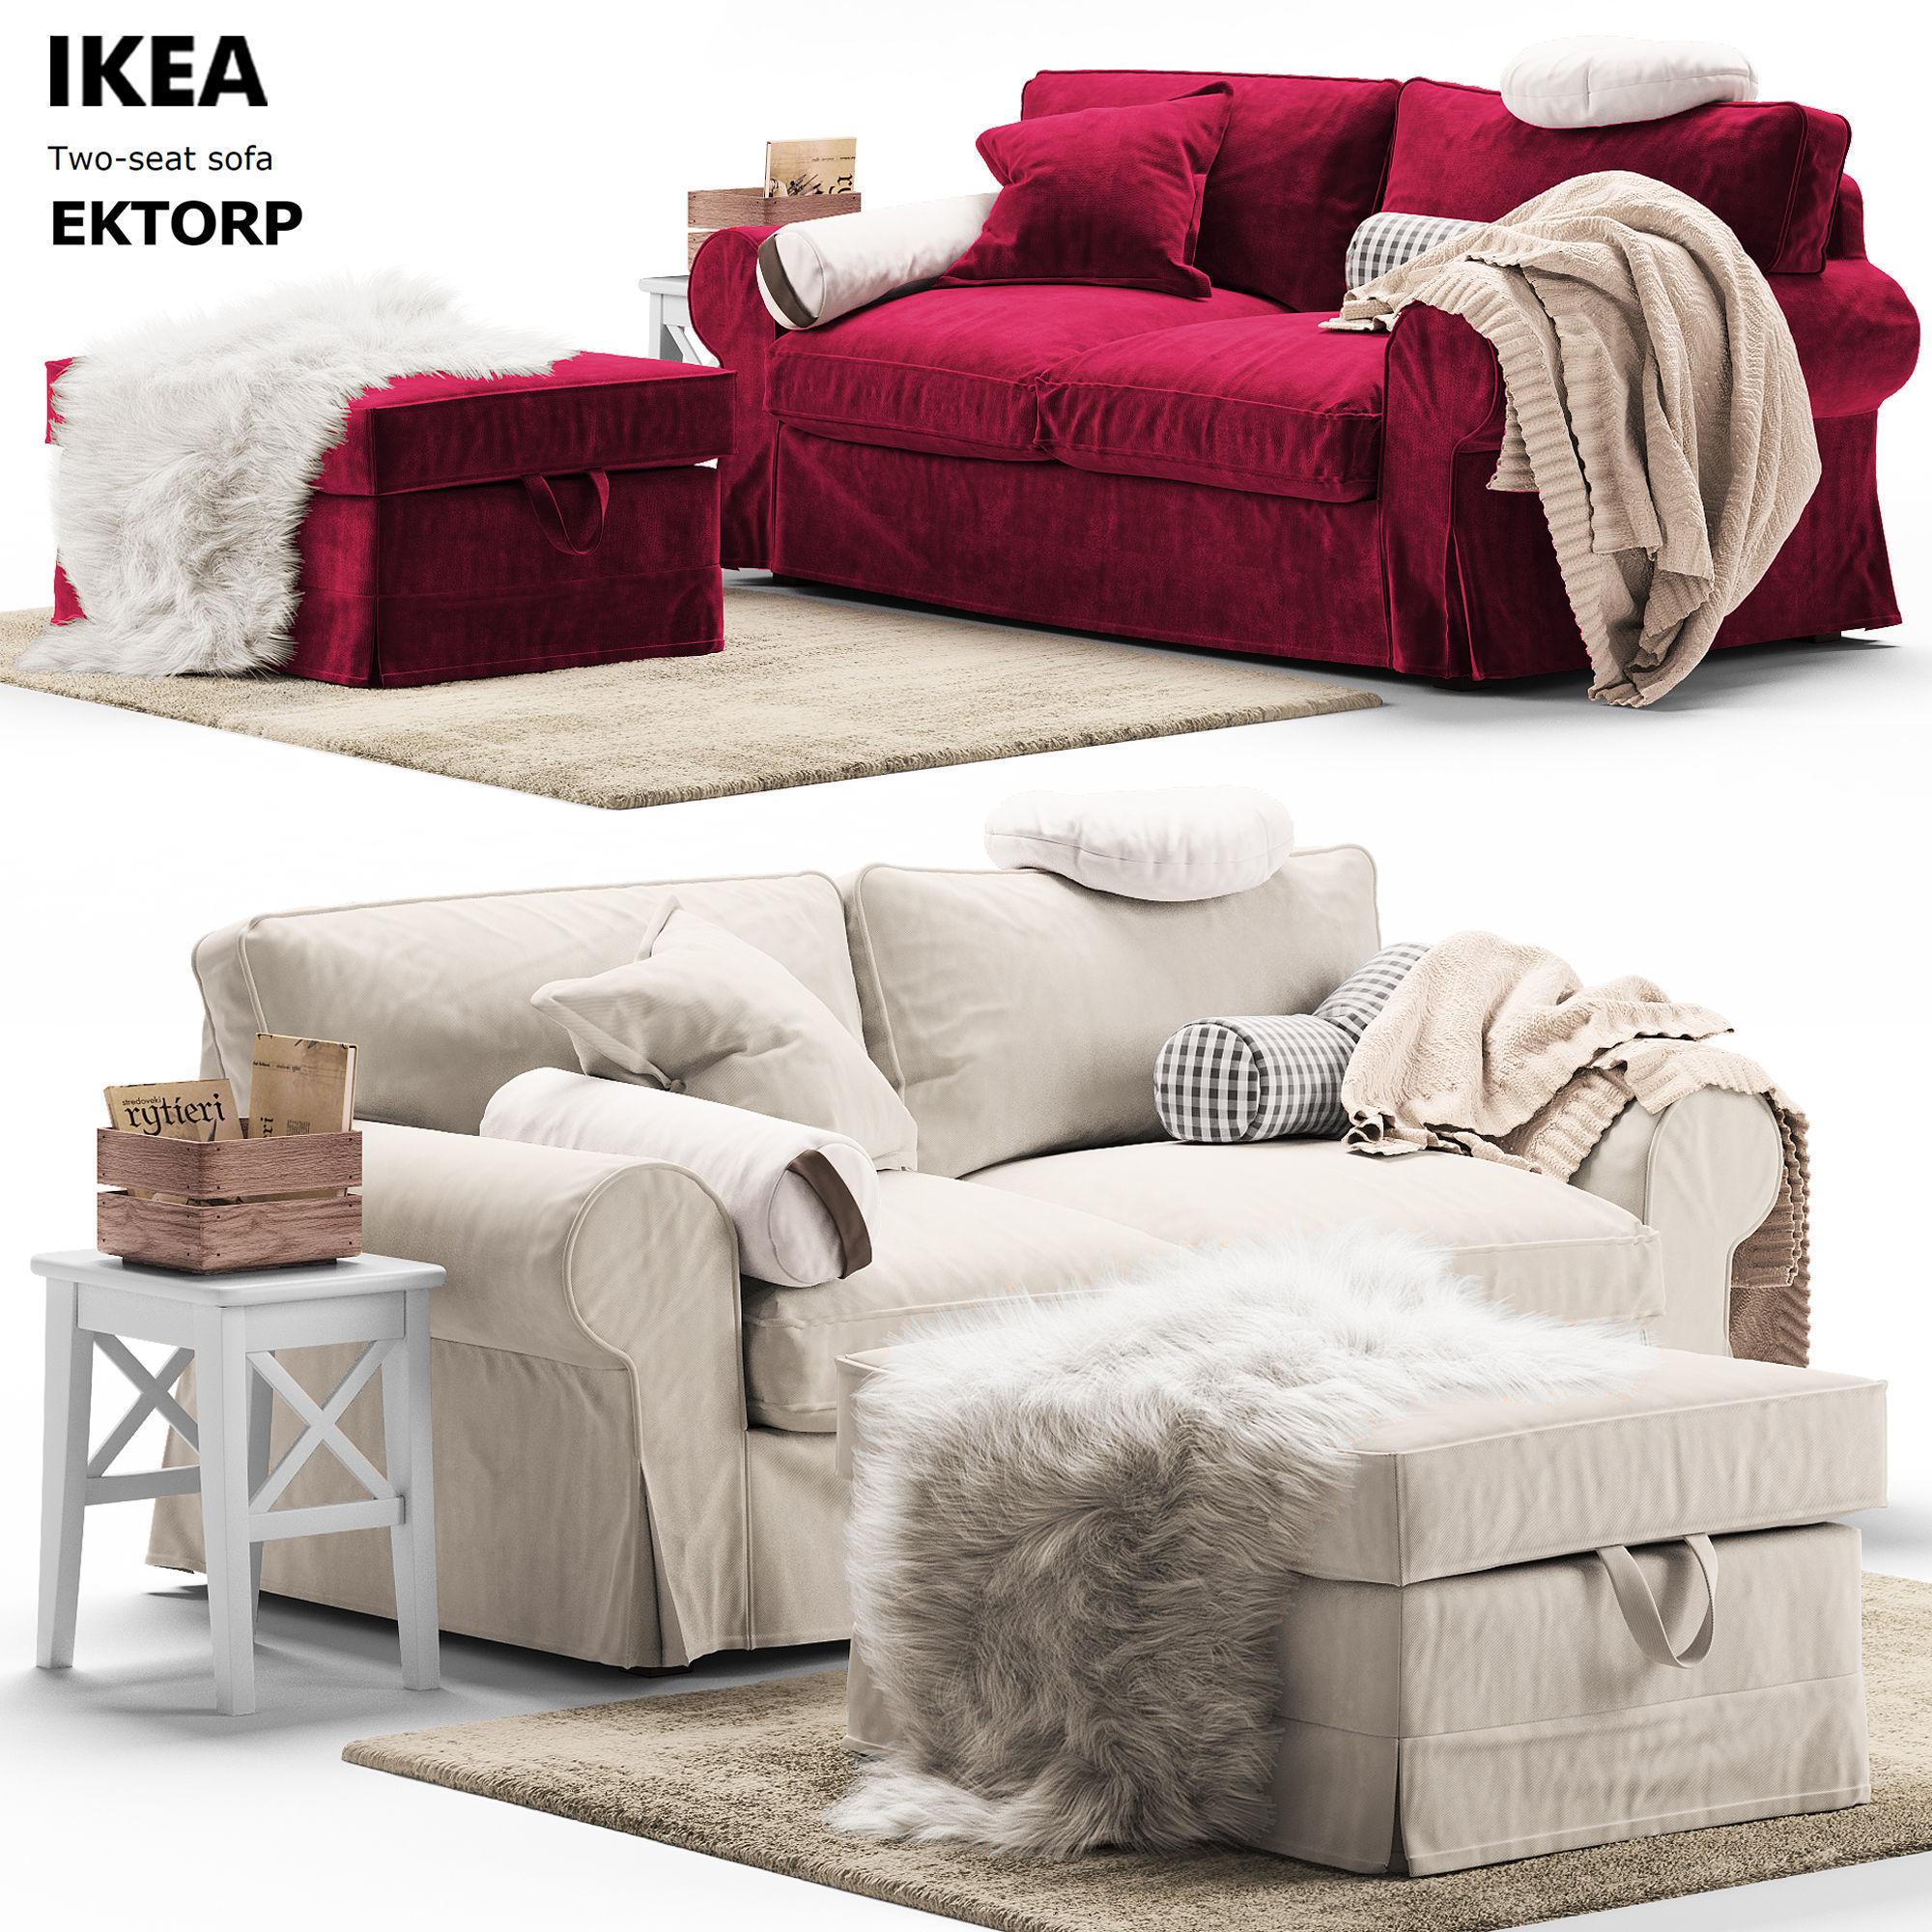 Sofa Ectorp ikea